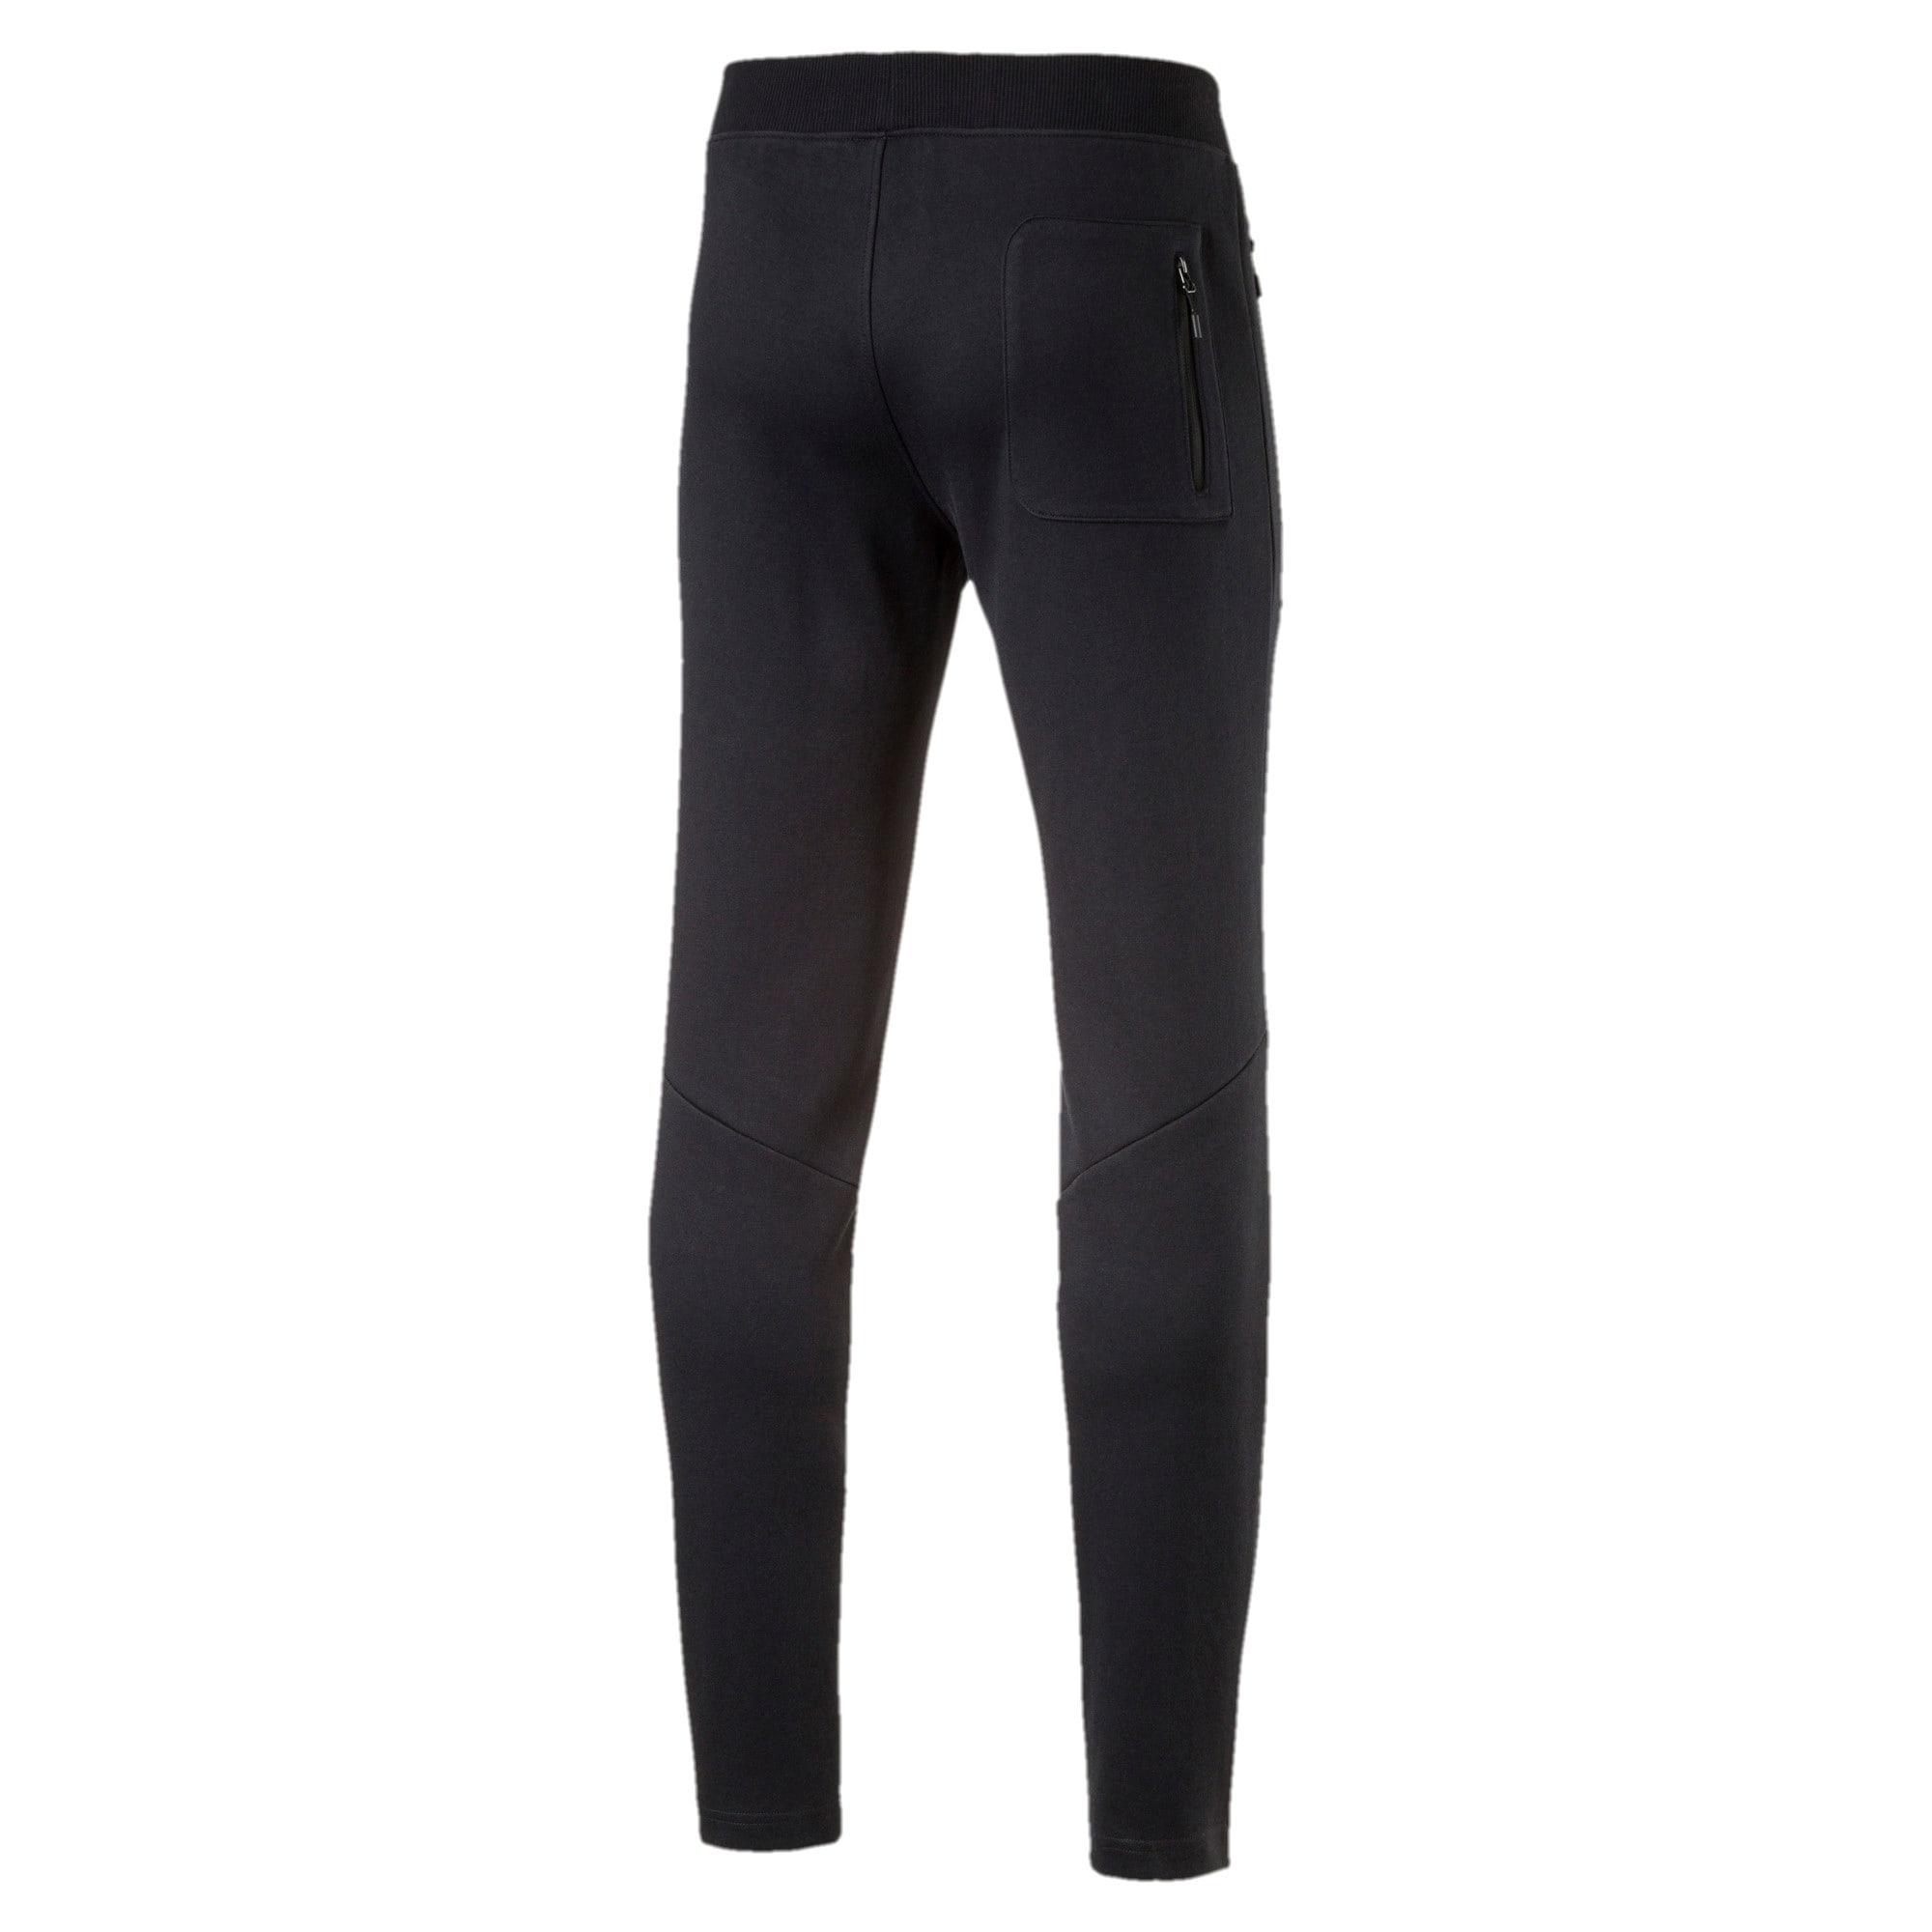 Thumbnail 5 of MERCEDES AMG PETRONAS Men's Sweatpants, Puma Black, medium-IND